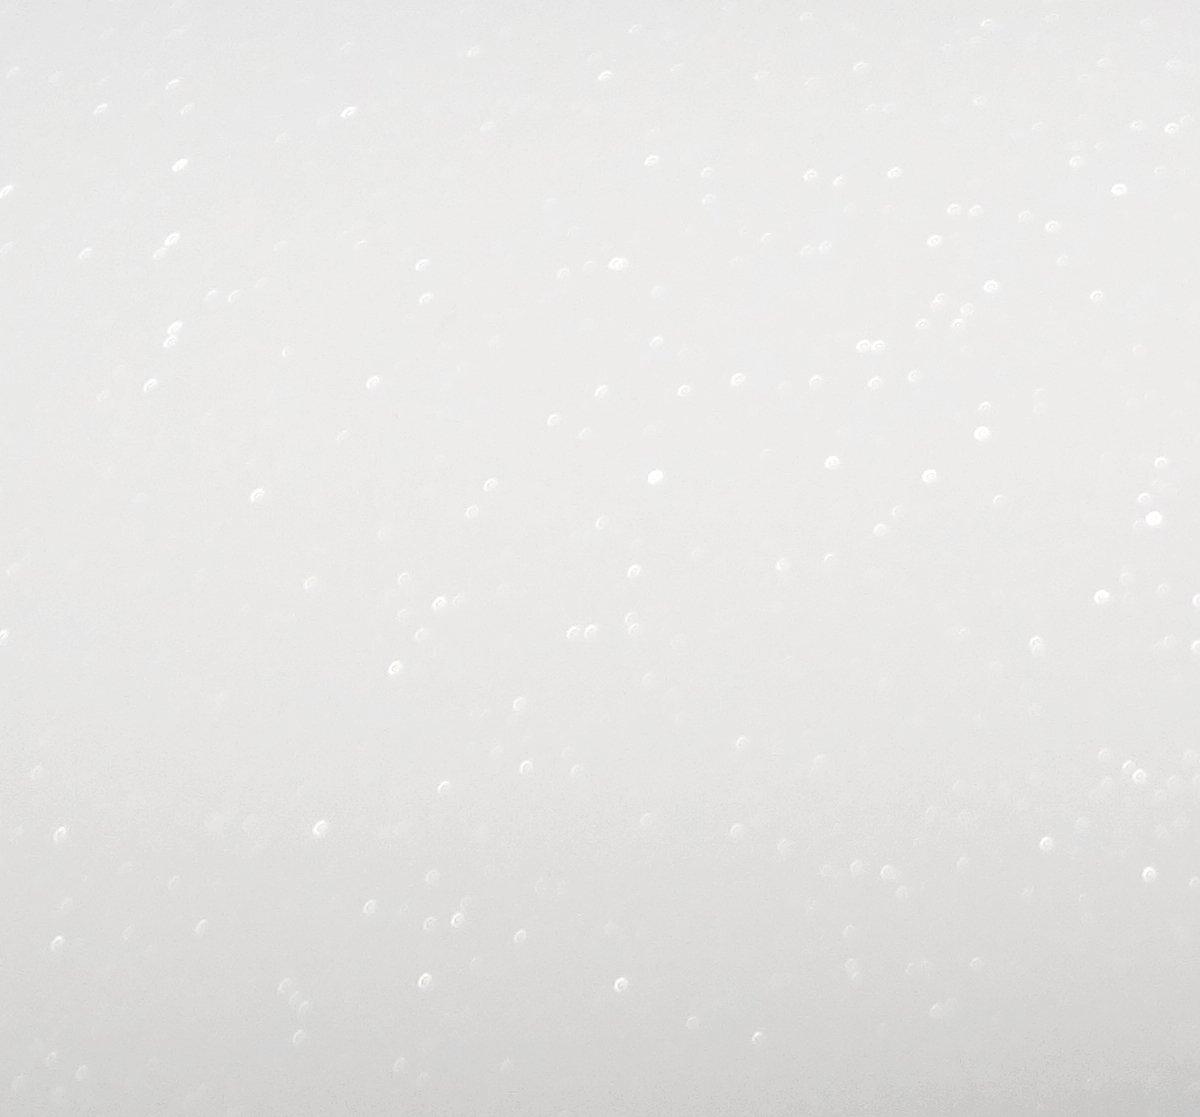 AERZETIX 150//50cm Pelicula Adhesiva Vinilo Blanco termoformable Revestimiento de Exterior Interior C17217